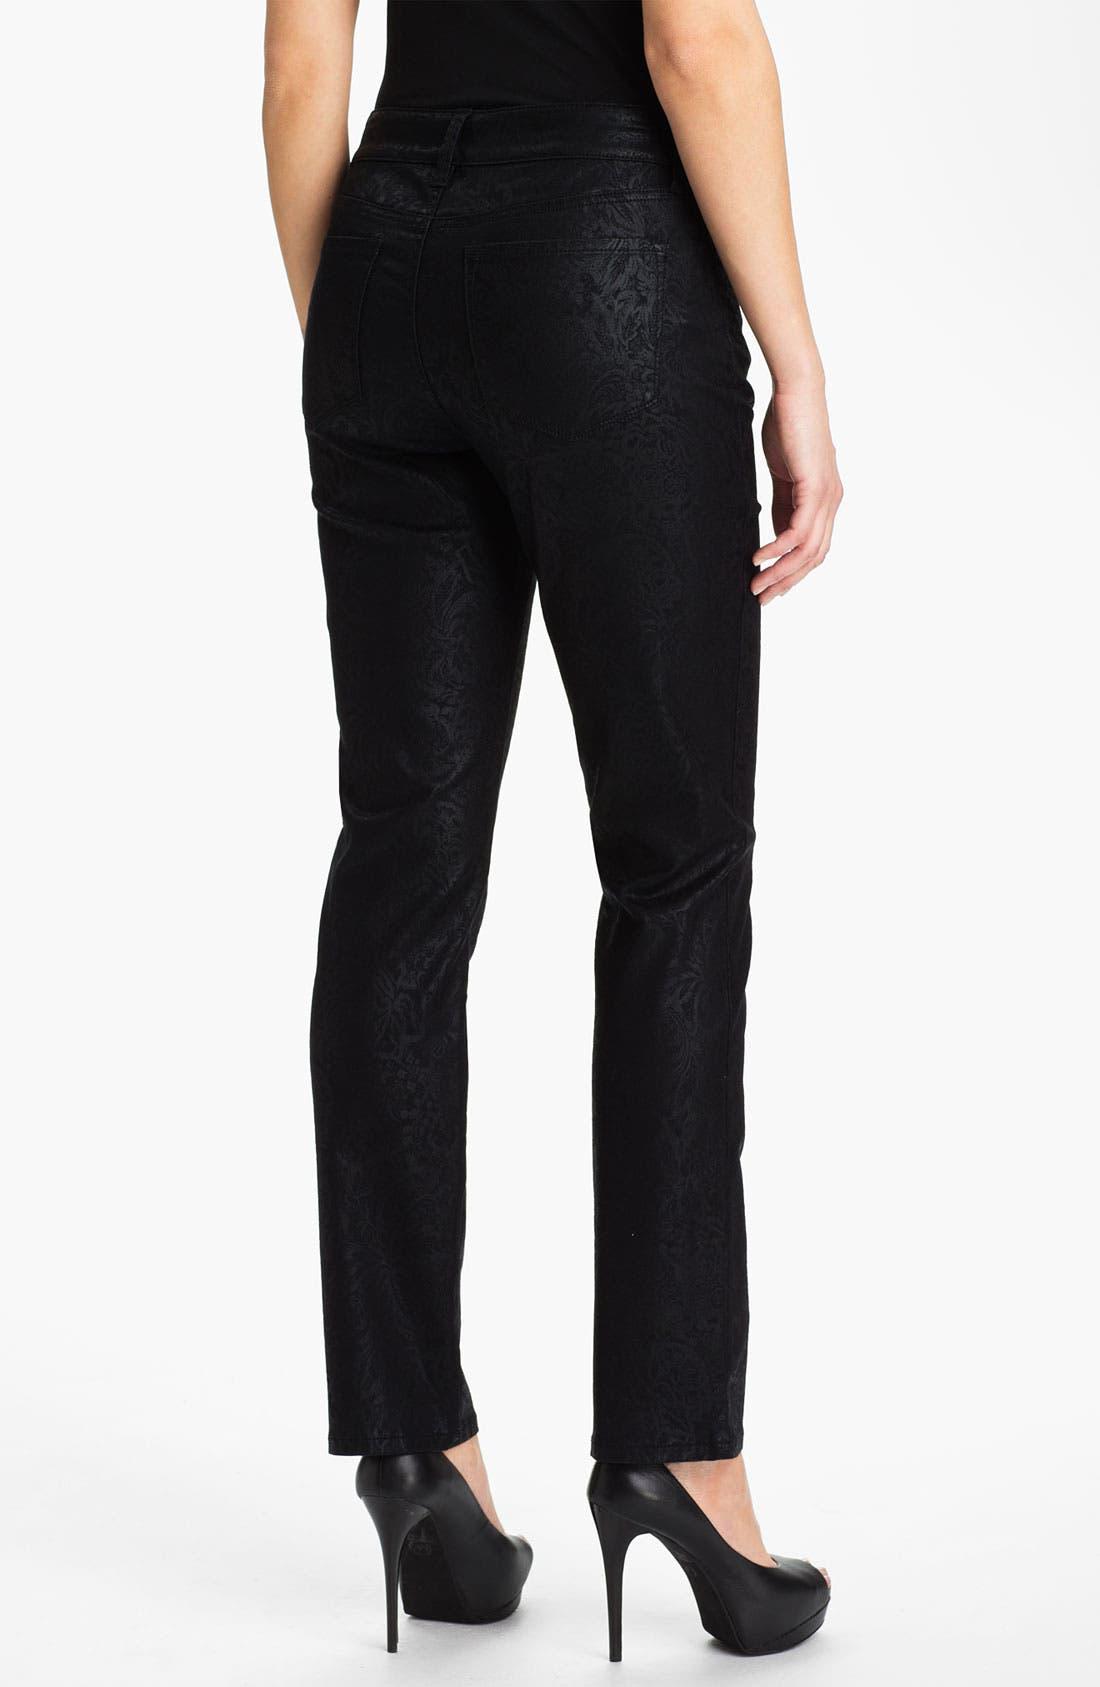 Alternate Image 2  - NYDJ 'Sheri - Metallic Gilded Lily' Twill Skinny Jeans (Petite)